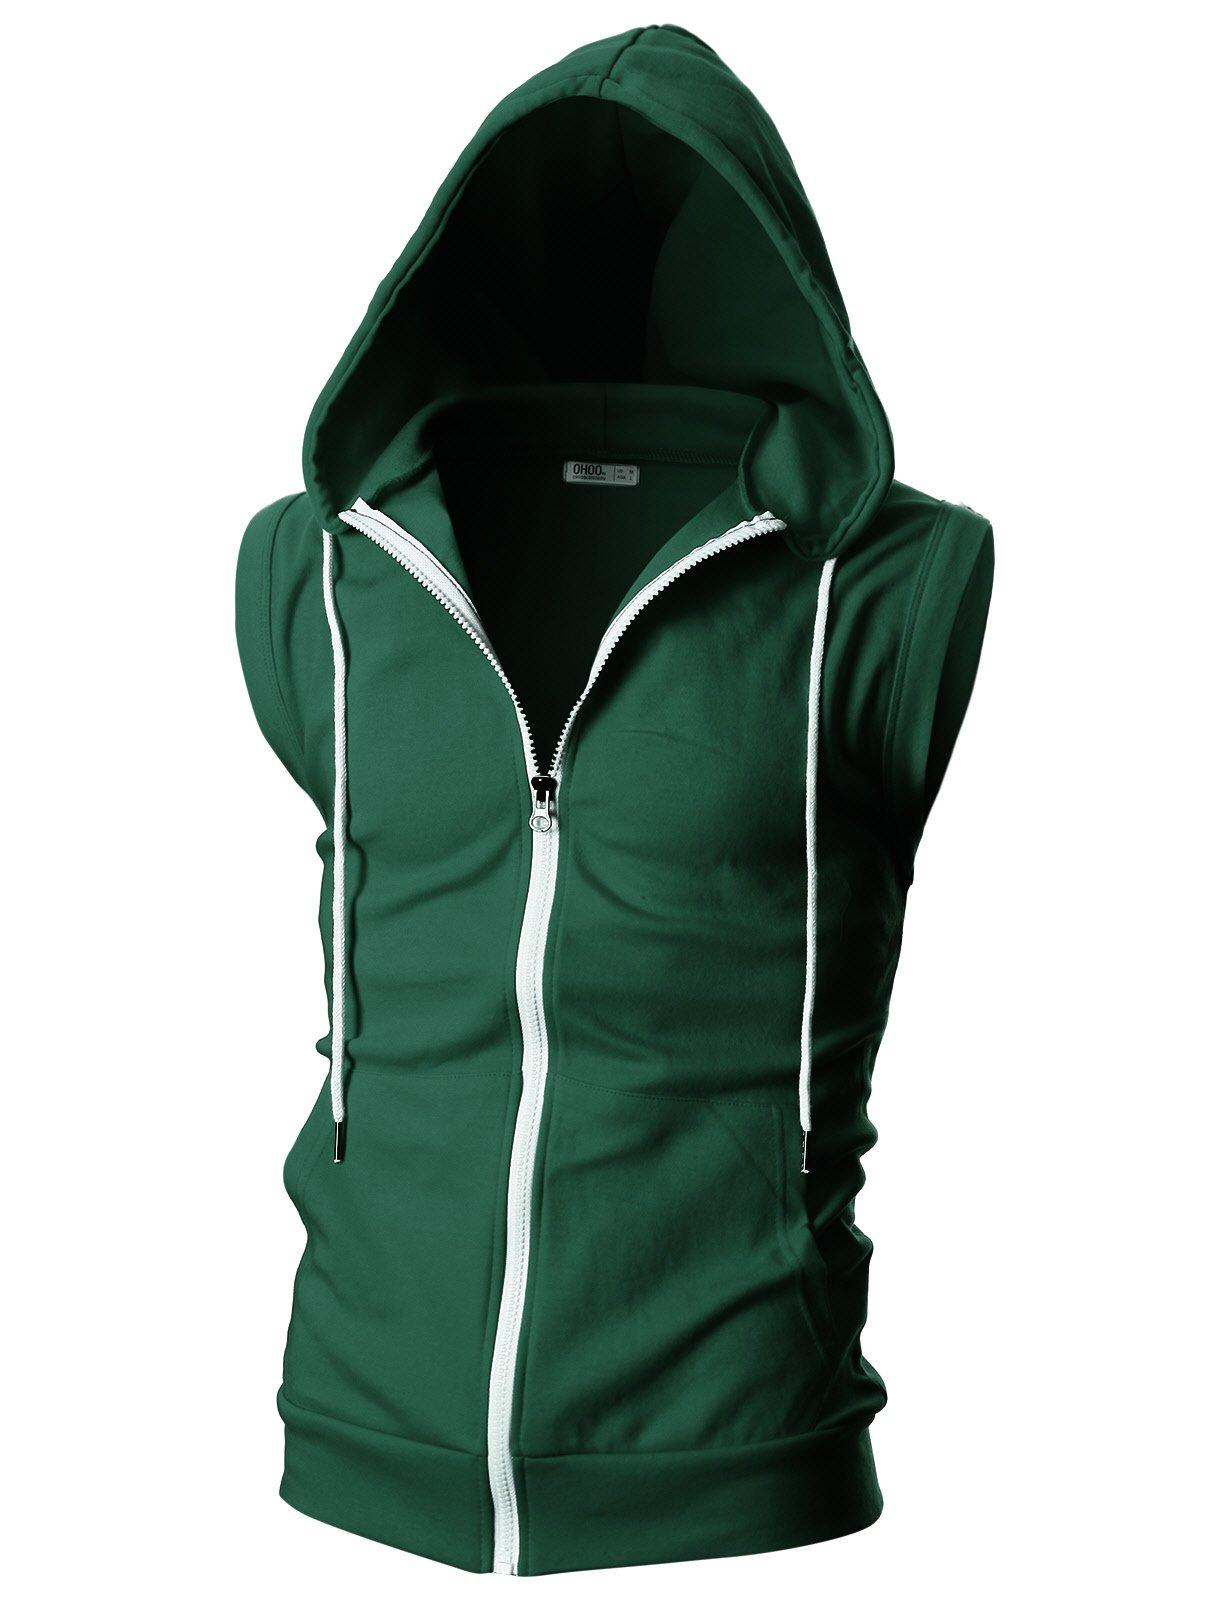 Ohoo Mens Slim Fit Sleeveless Lightweight Zip-up Hooded Vest with Single Slide Zipper/DCF012-GREEN-XL